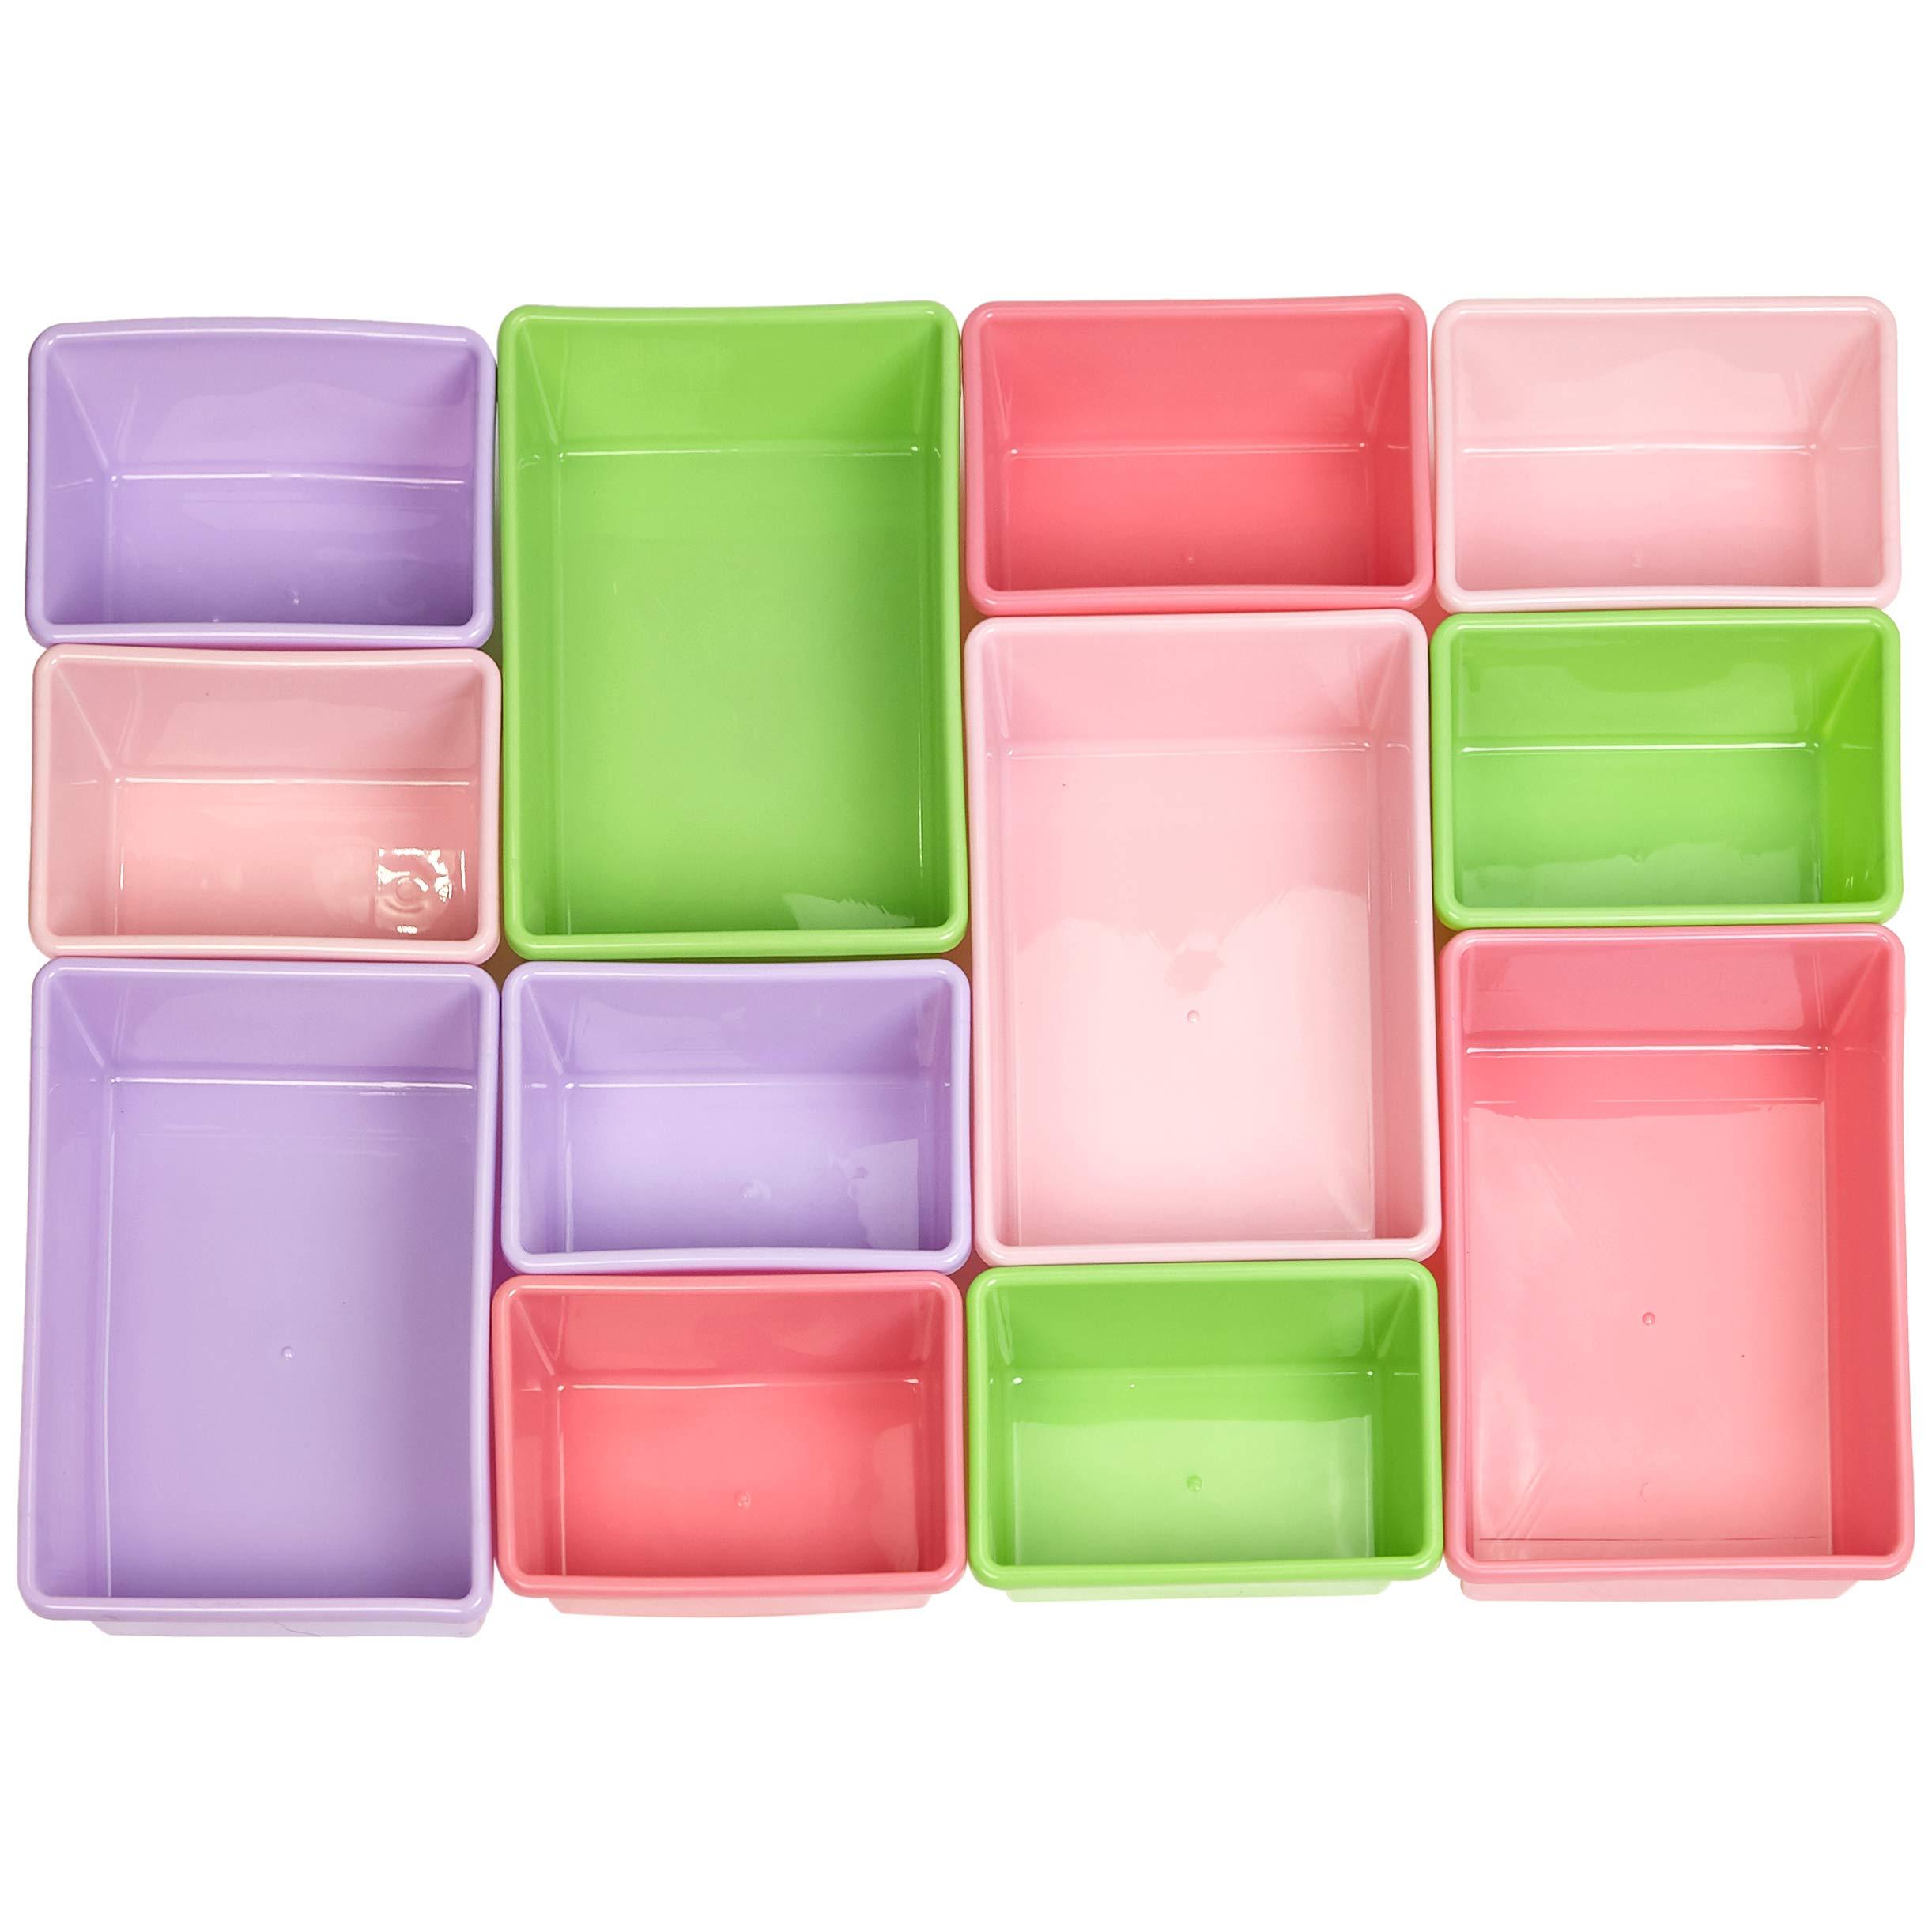 AmazonBasics Kids Toy Storage Organizer Bins - White/Pastel by AmazonBasics (Image #5)